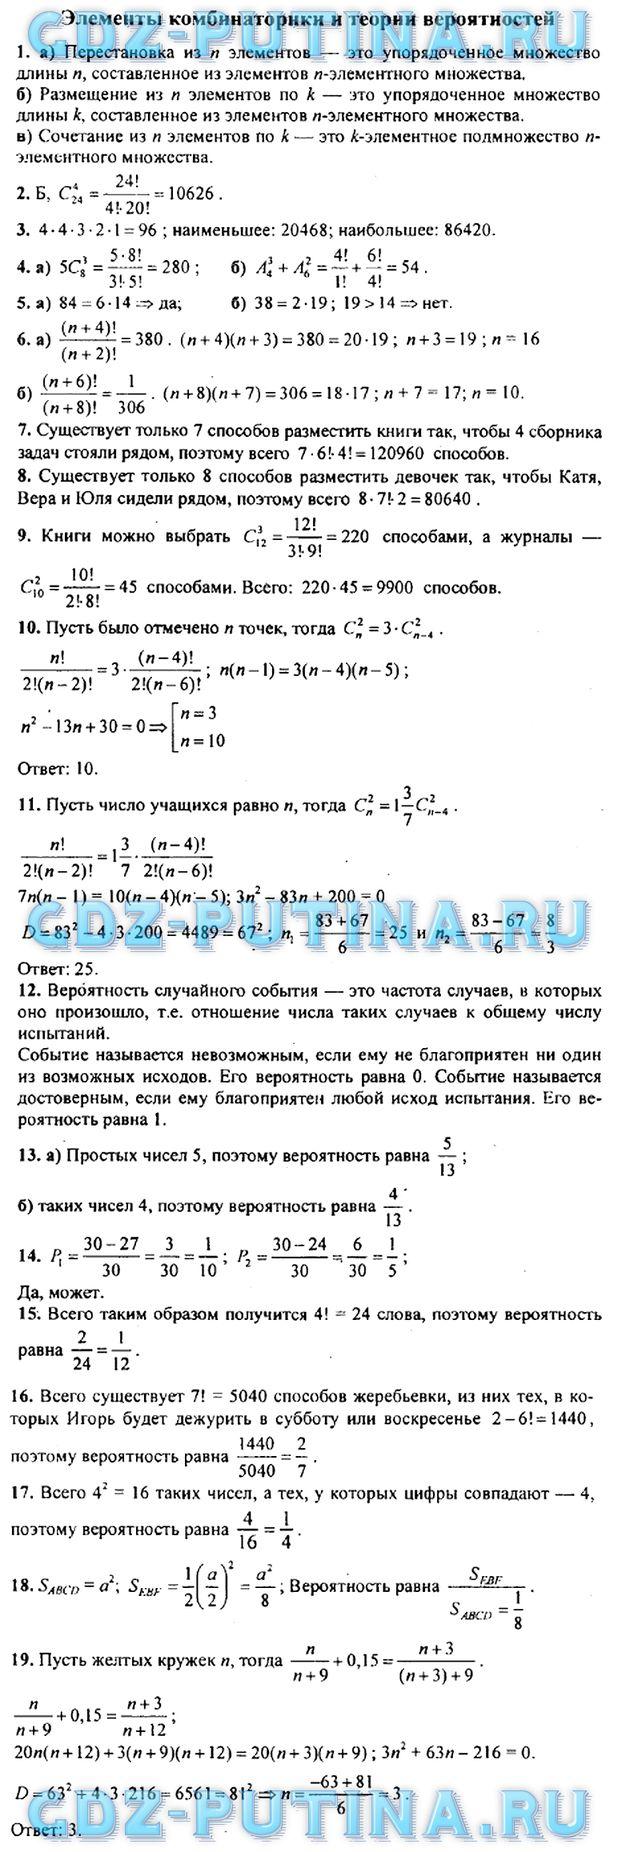 Гдз по теории вероятности 8 класс